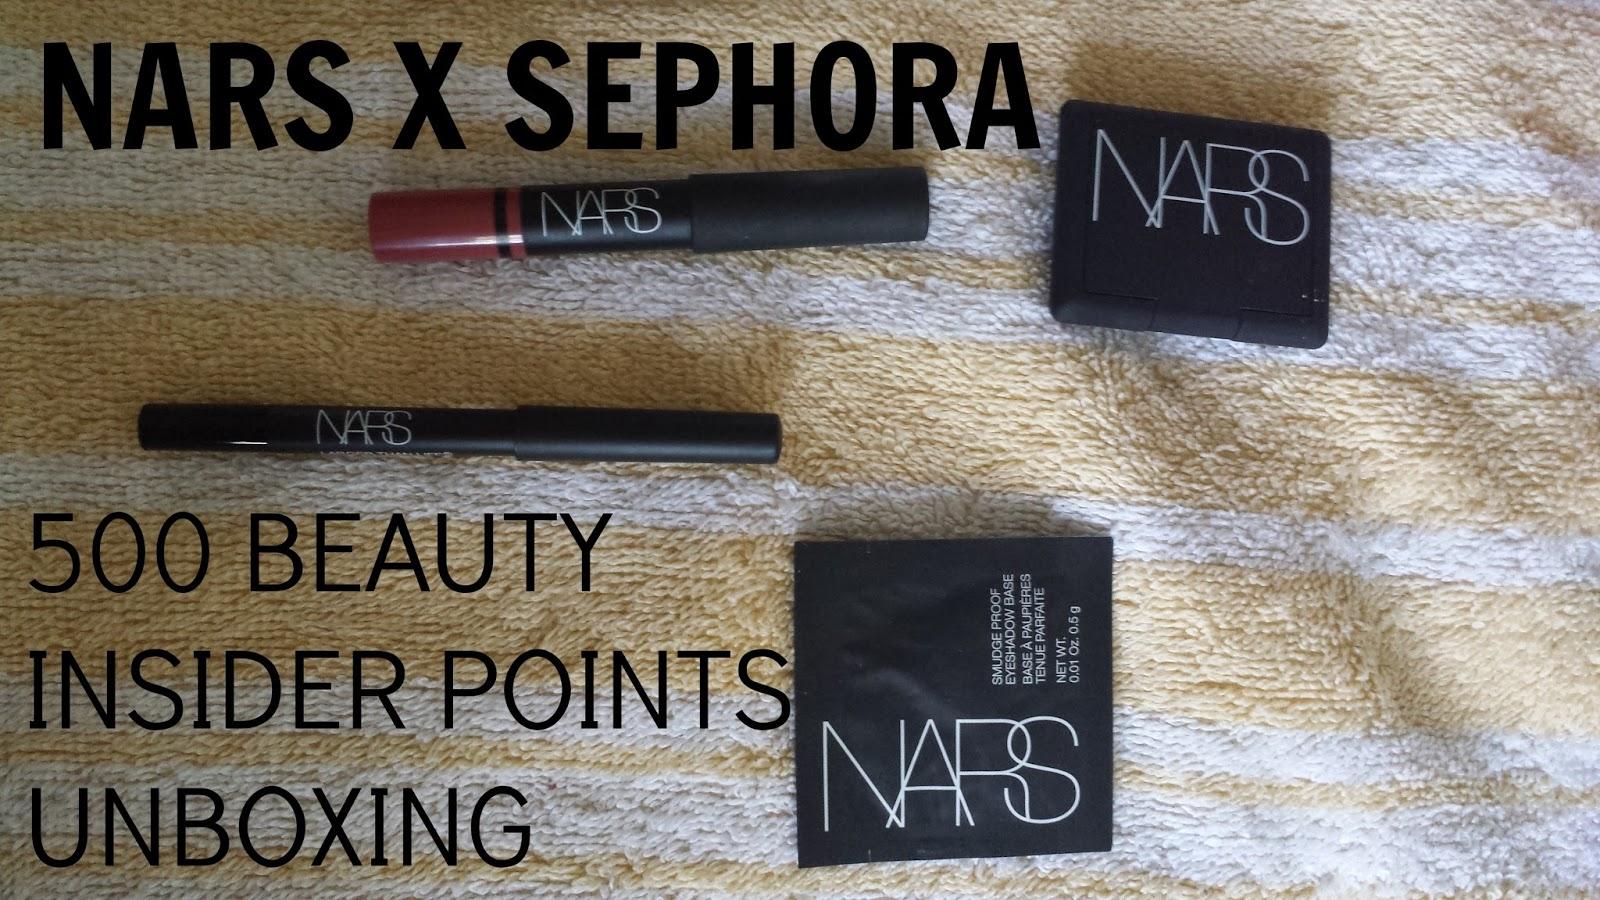 Unboxing NARS x Sephora 500 Beauty Insider Points Perk